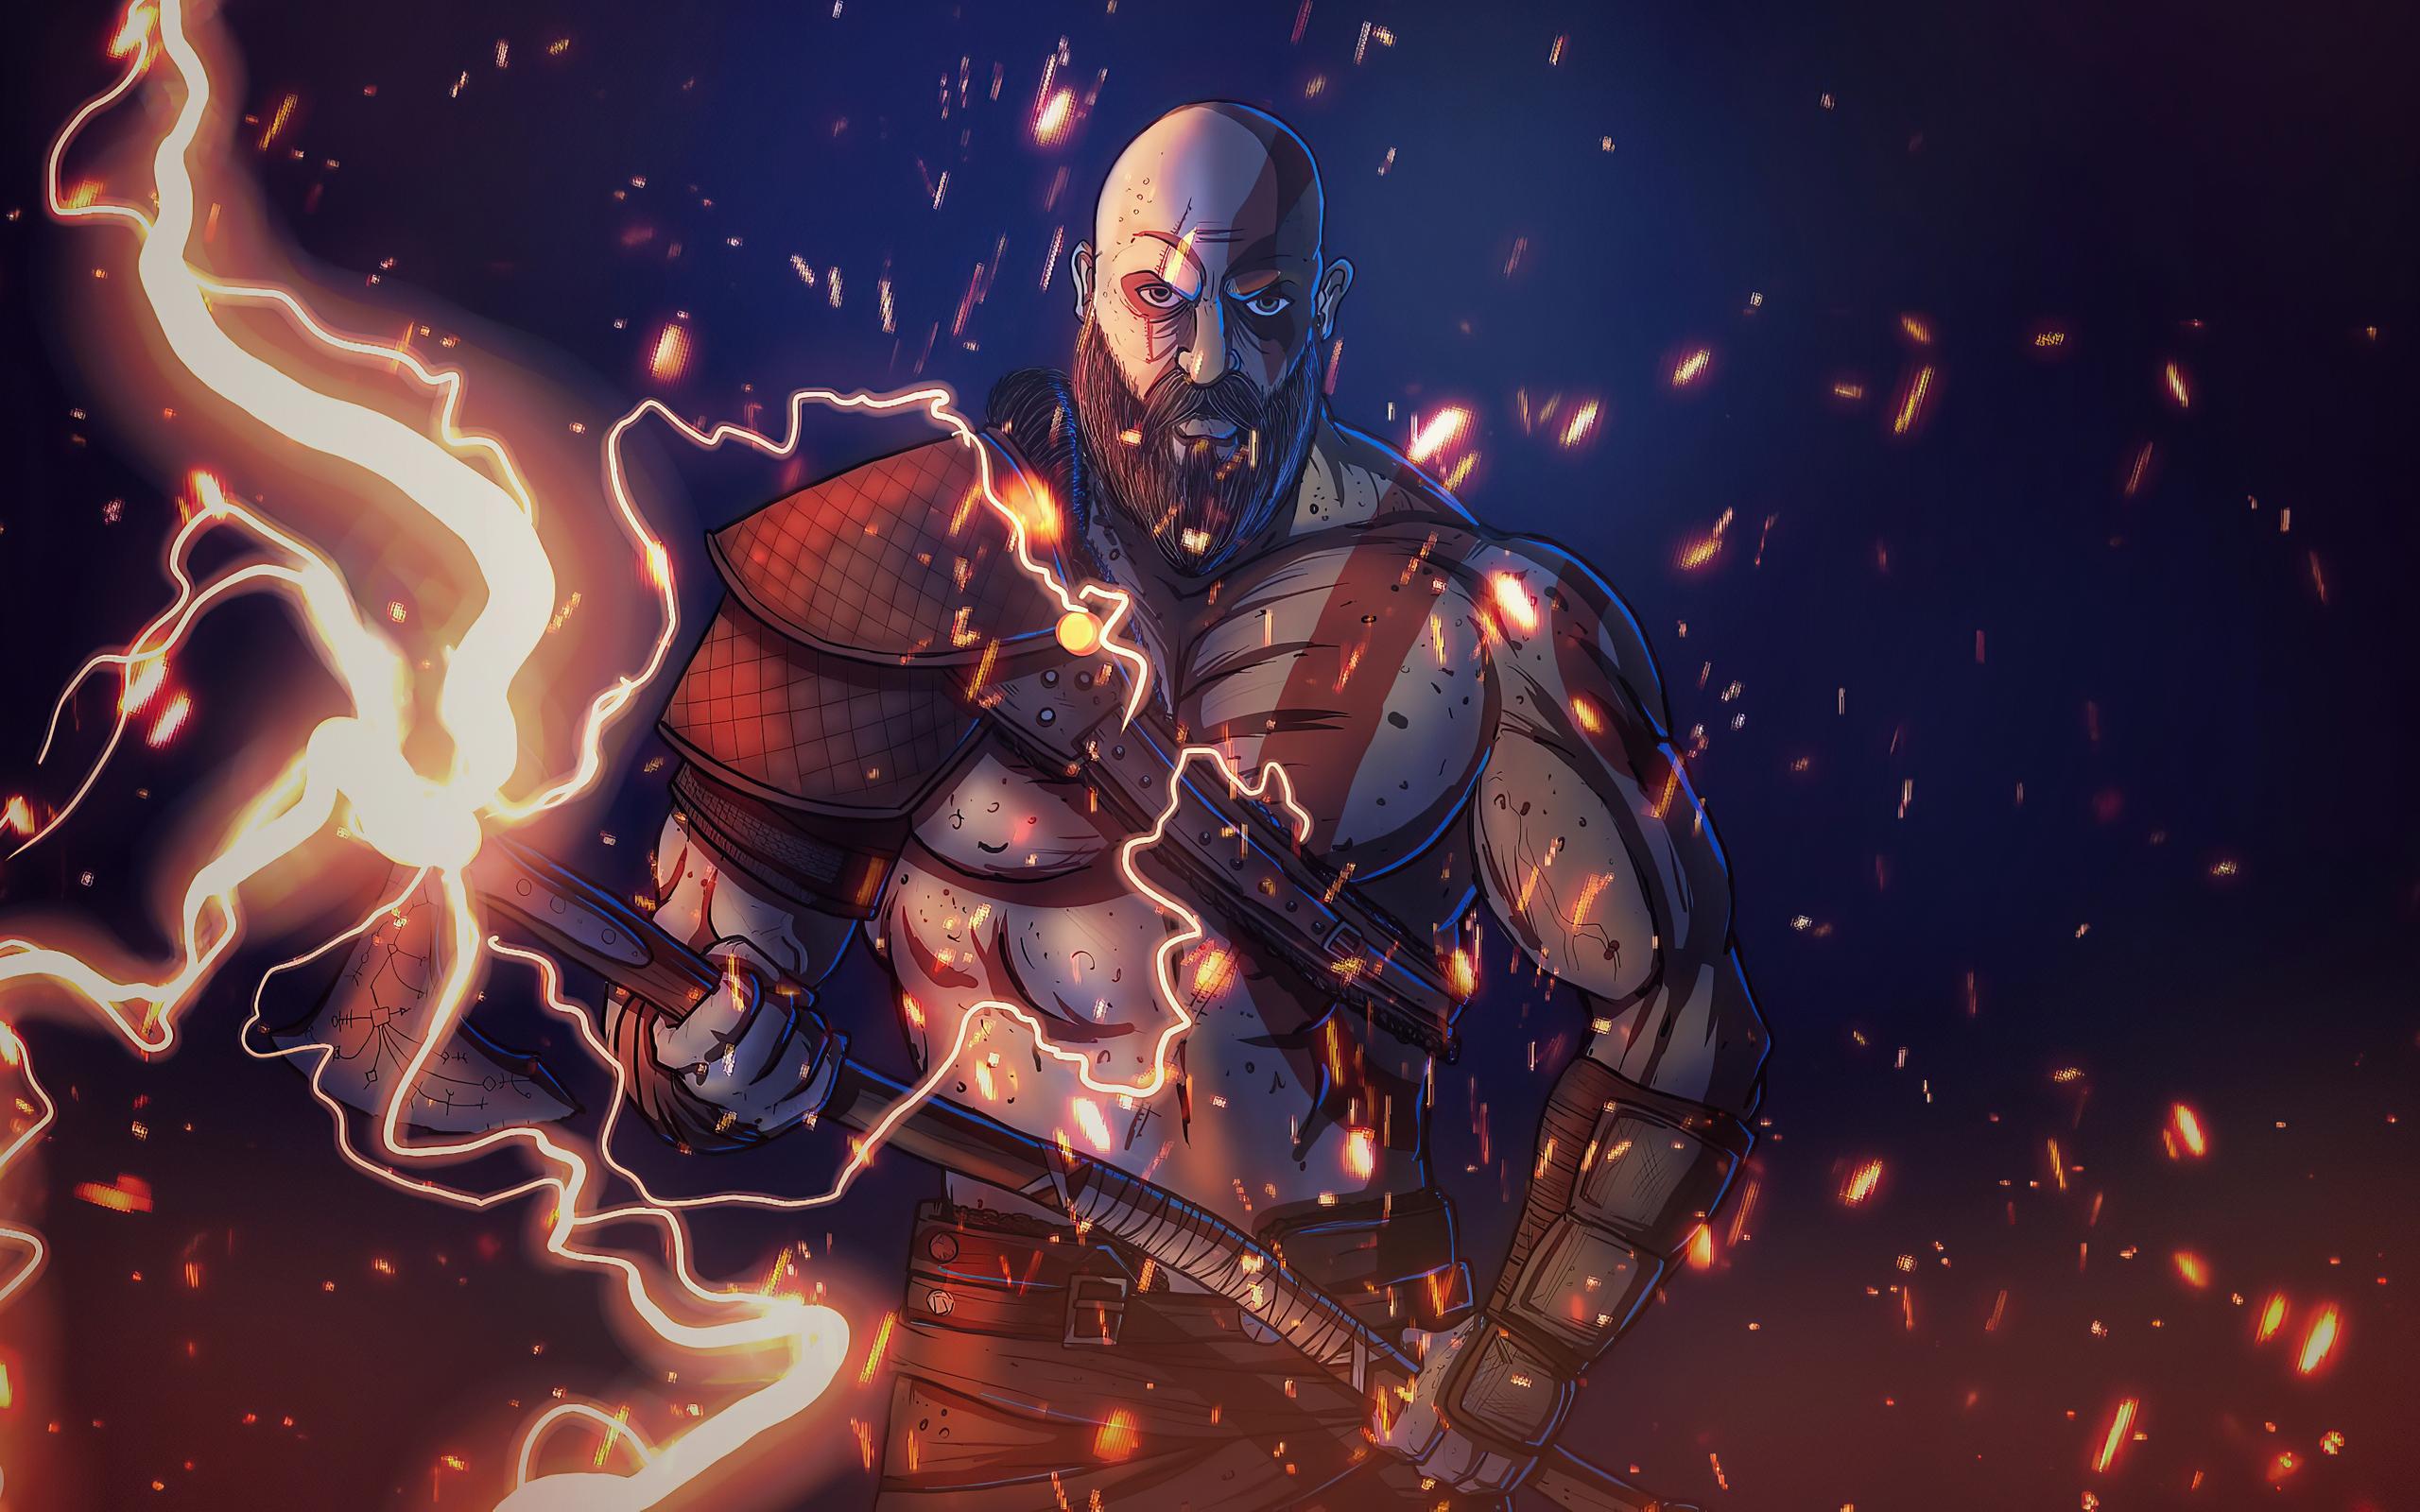 kratos-2020-artwork-4k-zj.jpg